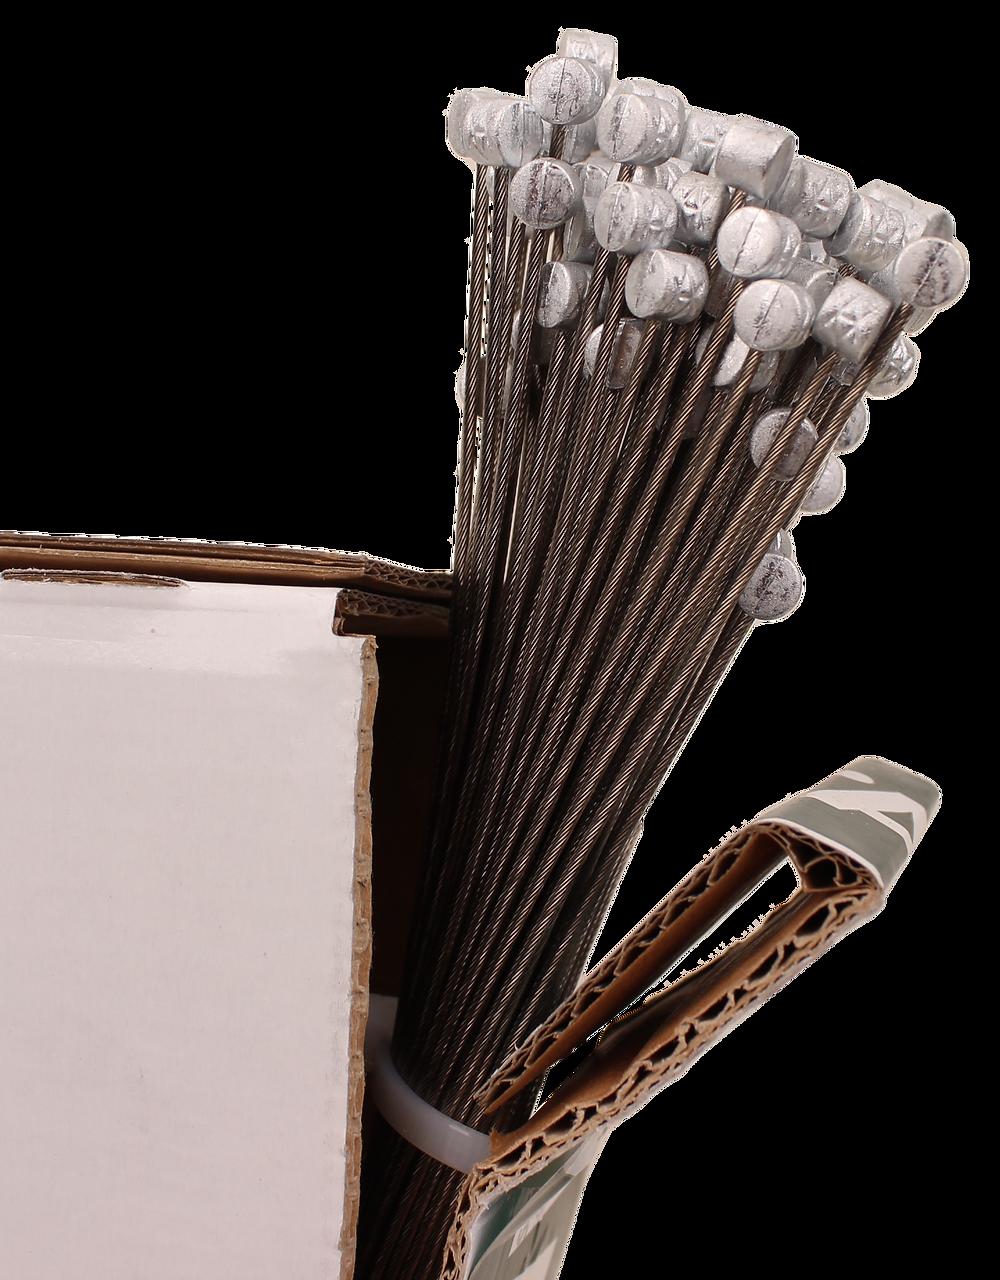 Bowden cable carton with barrel